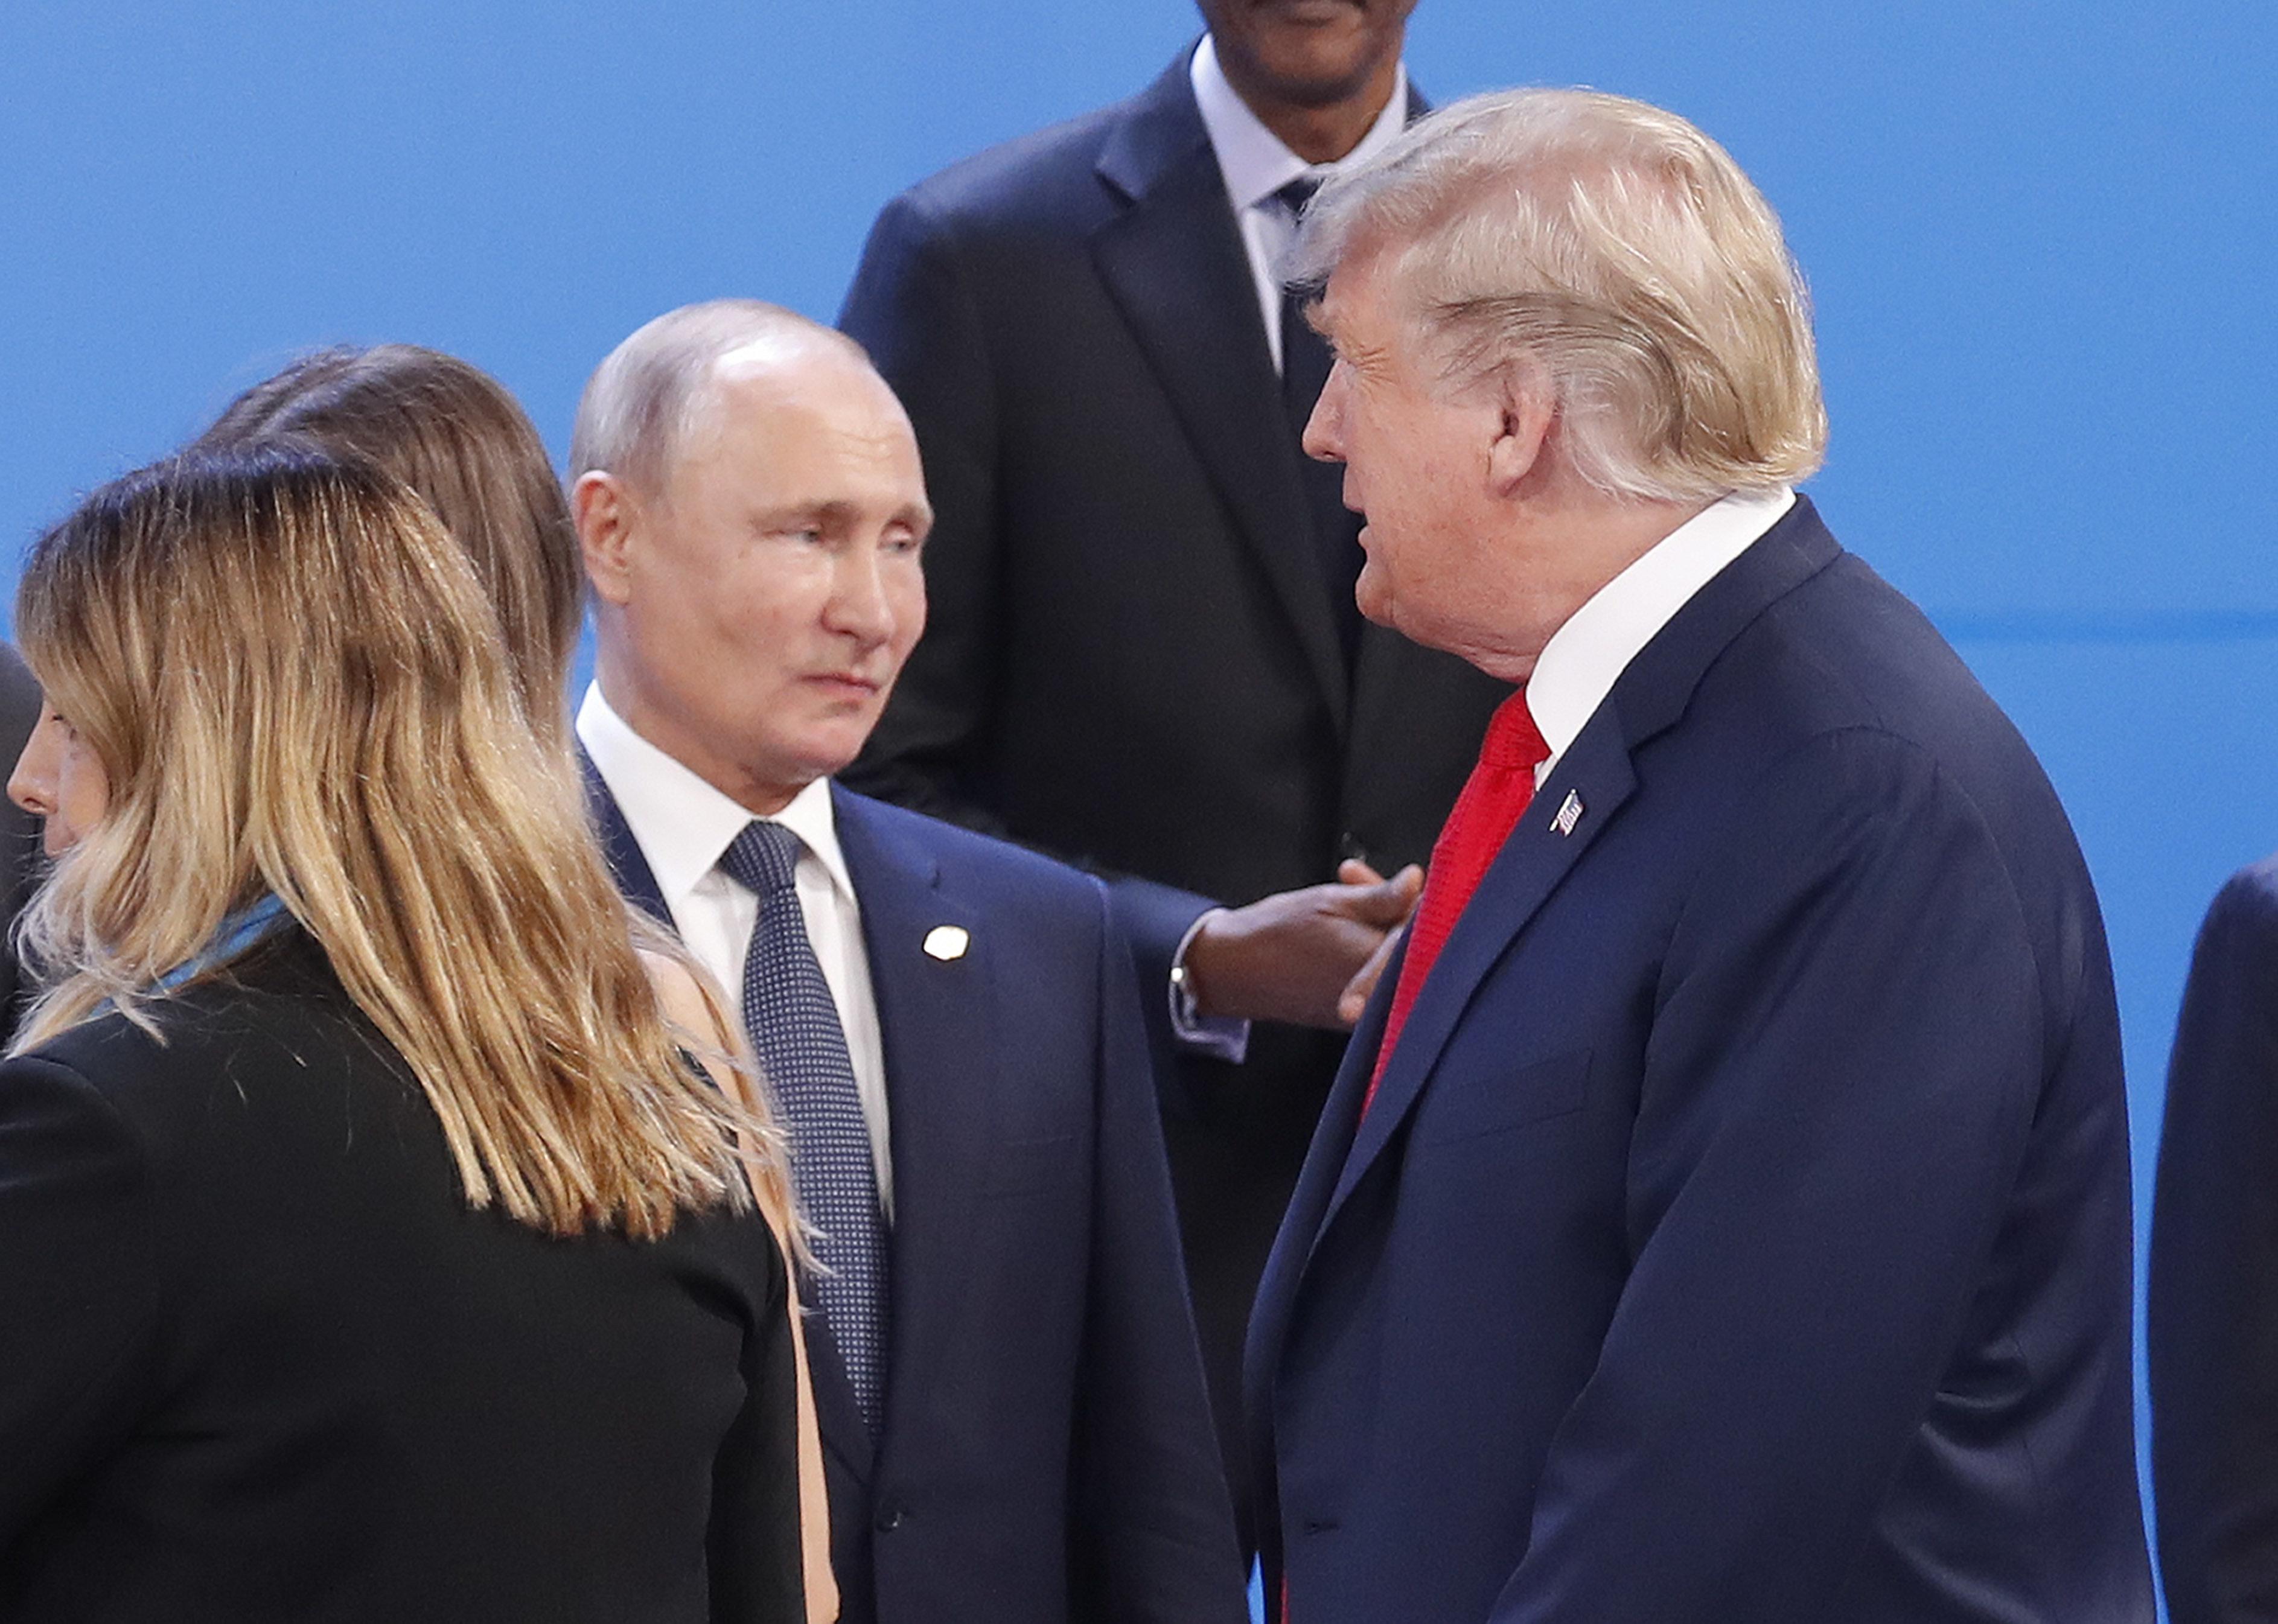 U.S. President Donald Trump and Russian President Vladimir Putin meet on the sidelines of the G-20 summit...